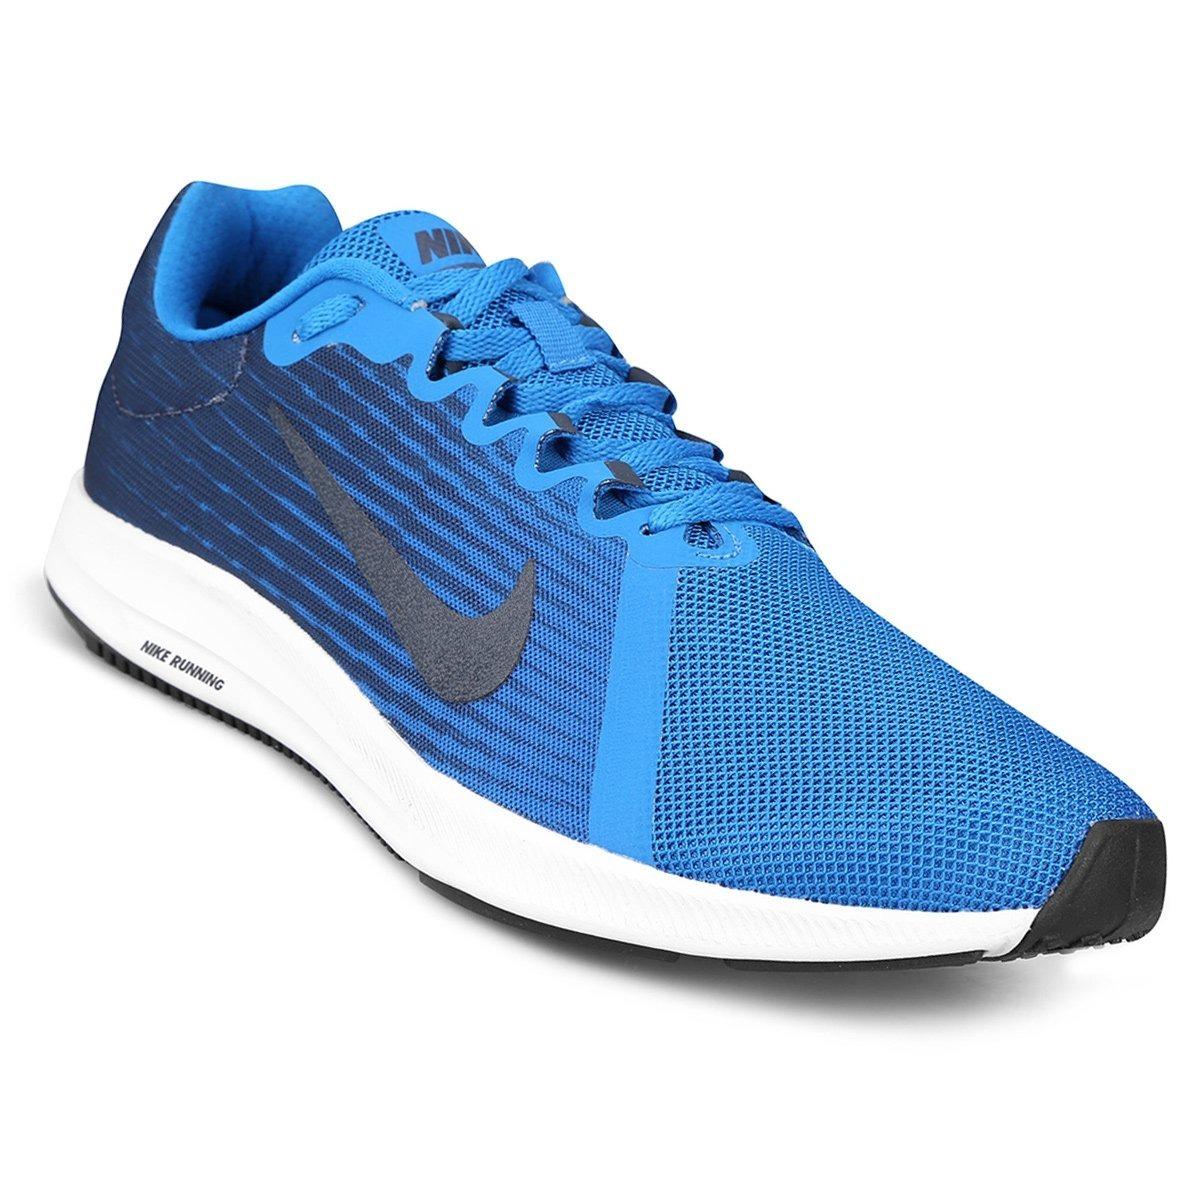 f25abb763eb39 zapatillas nike downshifter 8 - azul. Cargando zoom.